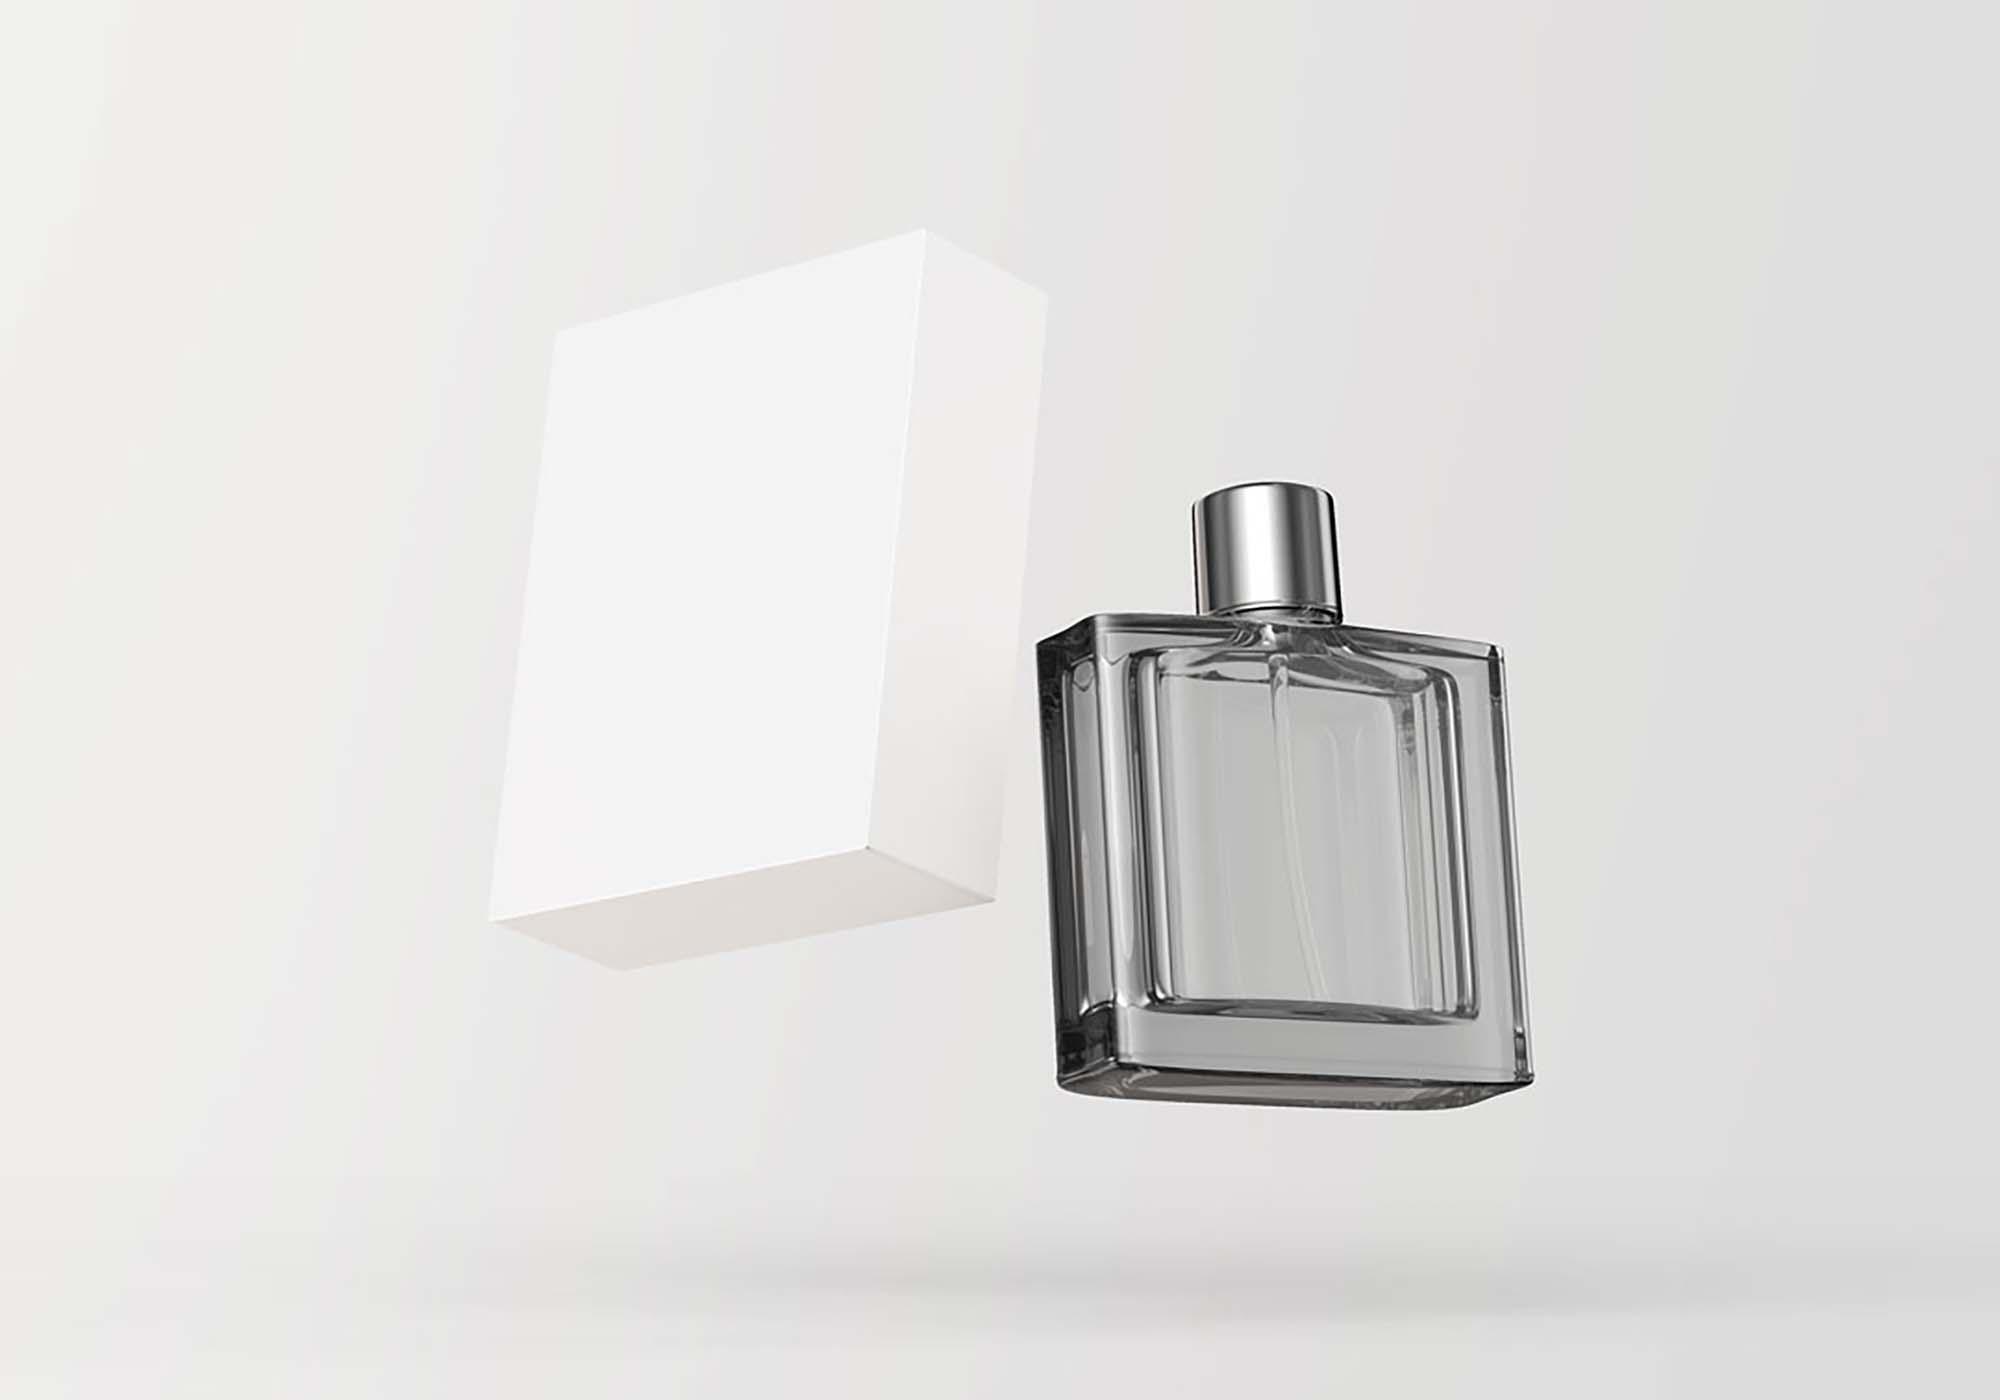 Floating Perfume Mockup 2